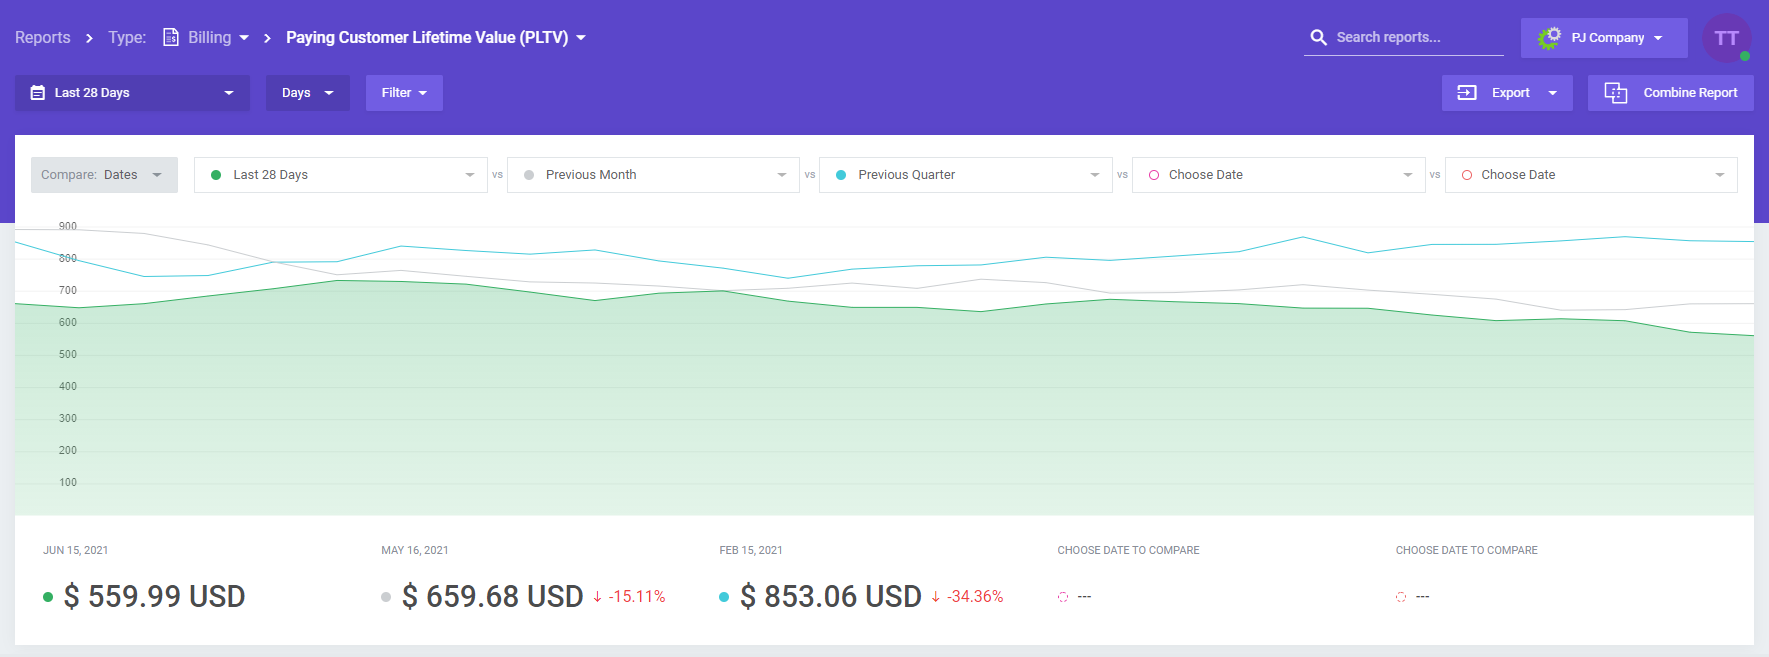 Paying Customer Lifetime Value - MetricsCube